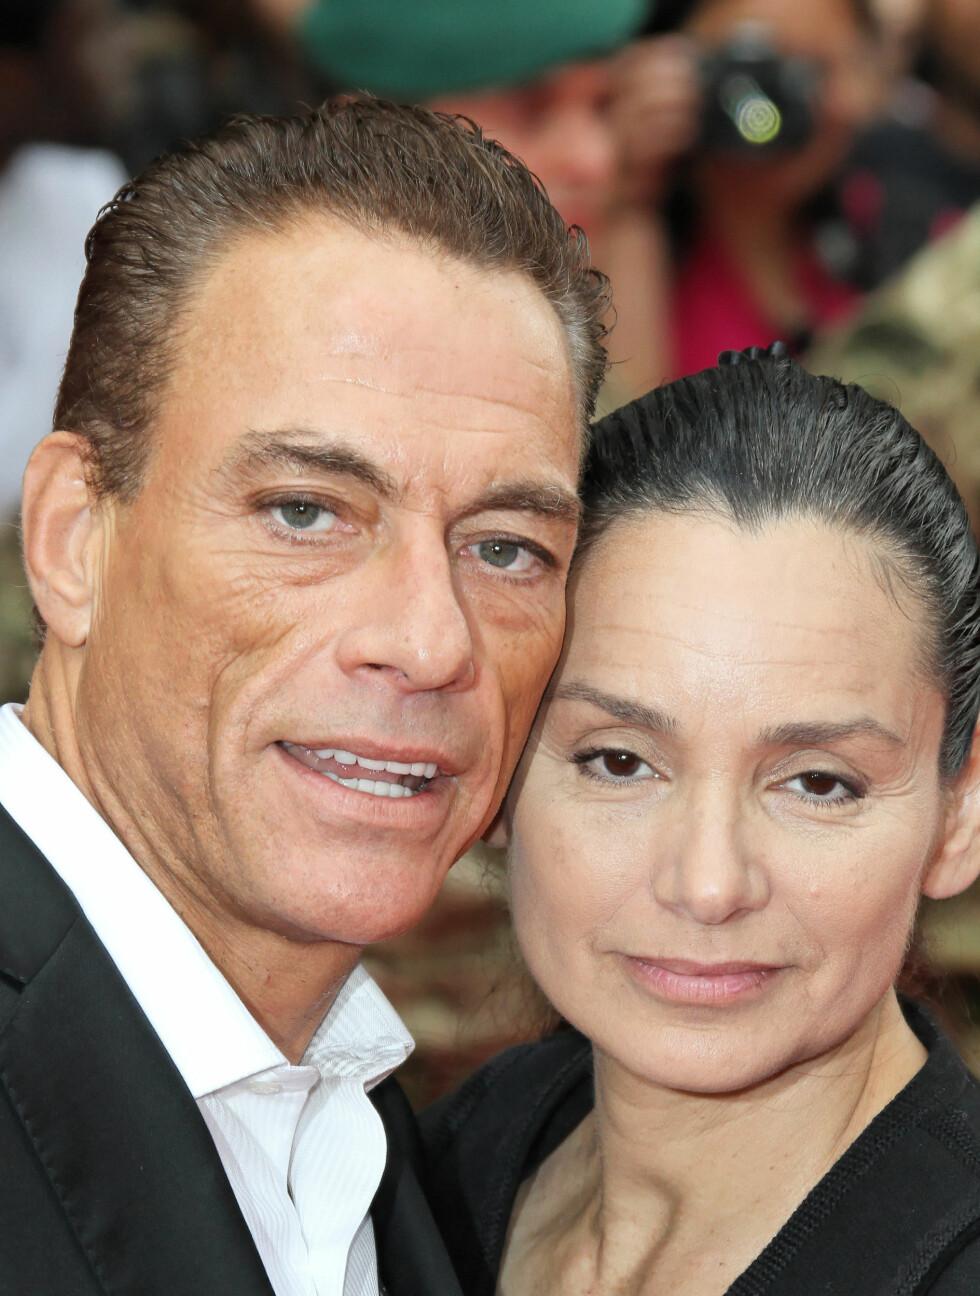 GIFT TO GANGER: Jean Claude og Gladys giftet seg først i 1987, før de skilte seg i 1992. Deretter giftet de seg for andre og foreløpig siste gang i 1999. Van Damme har vært gift tilsammen fem ganger.  Foto: Fame Flynet